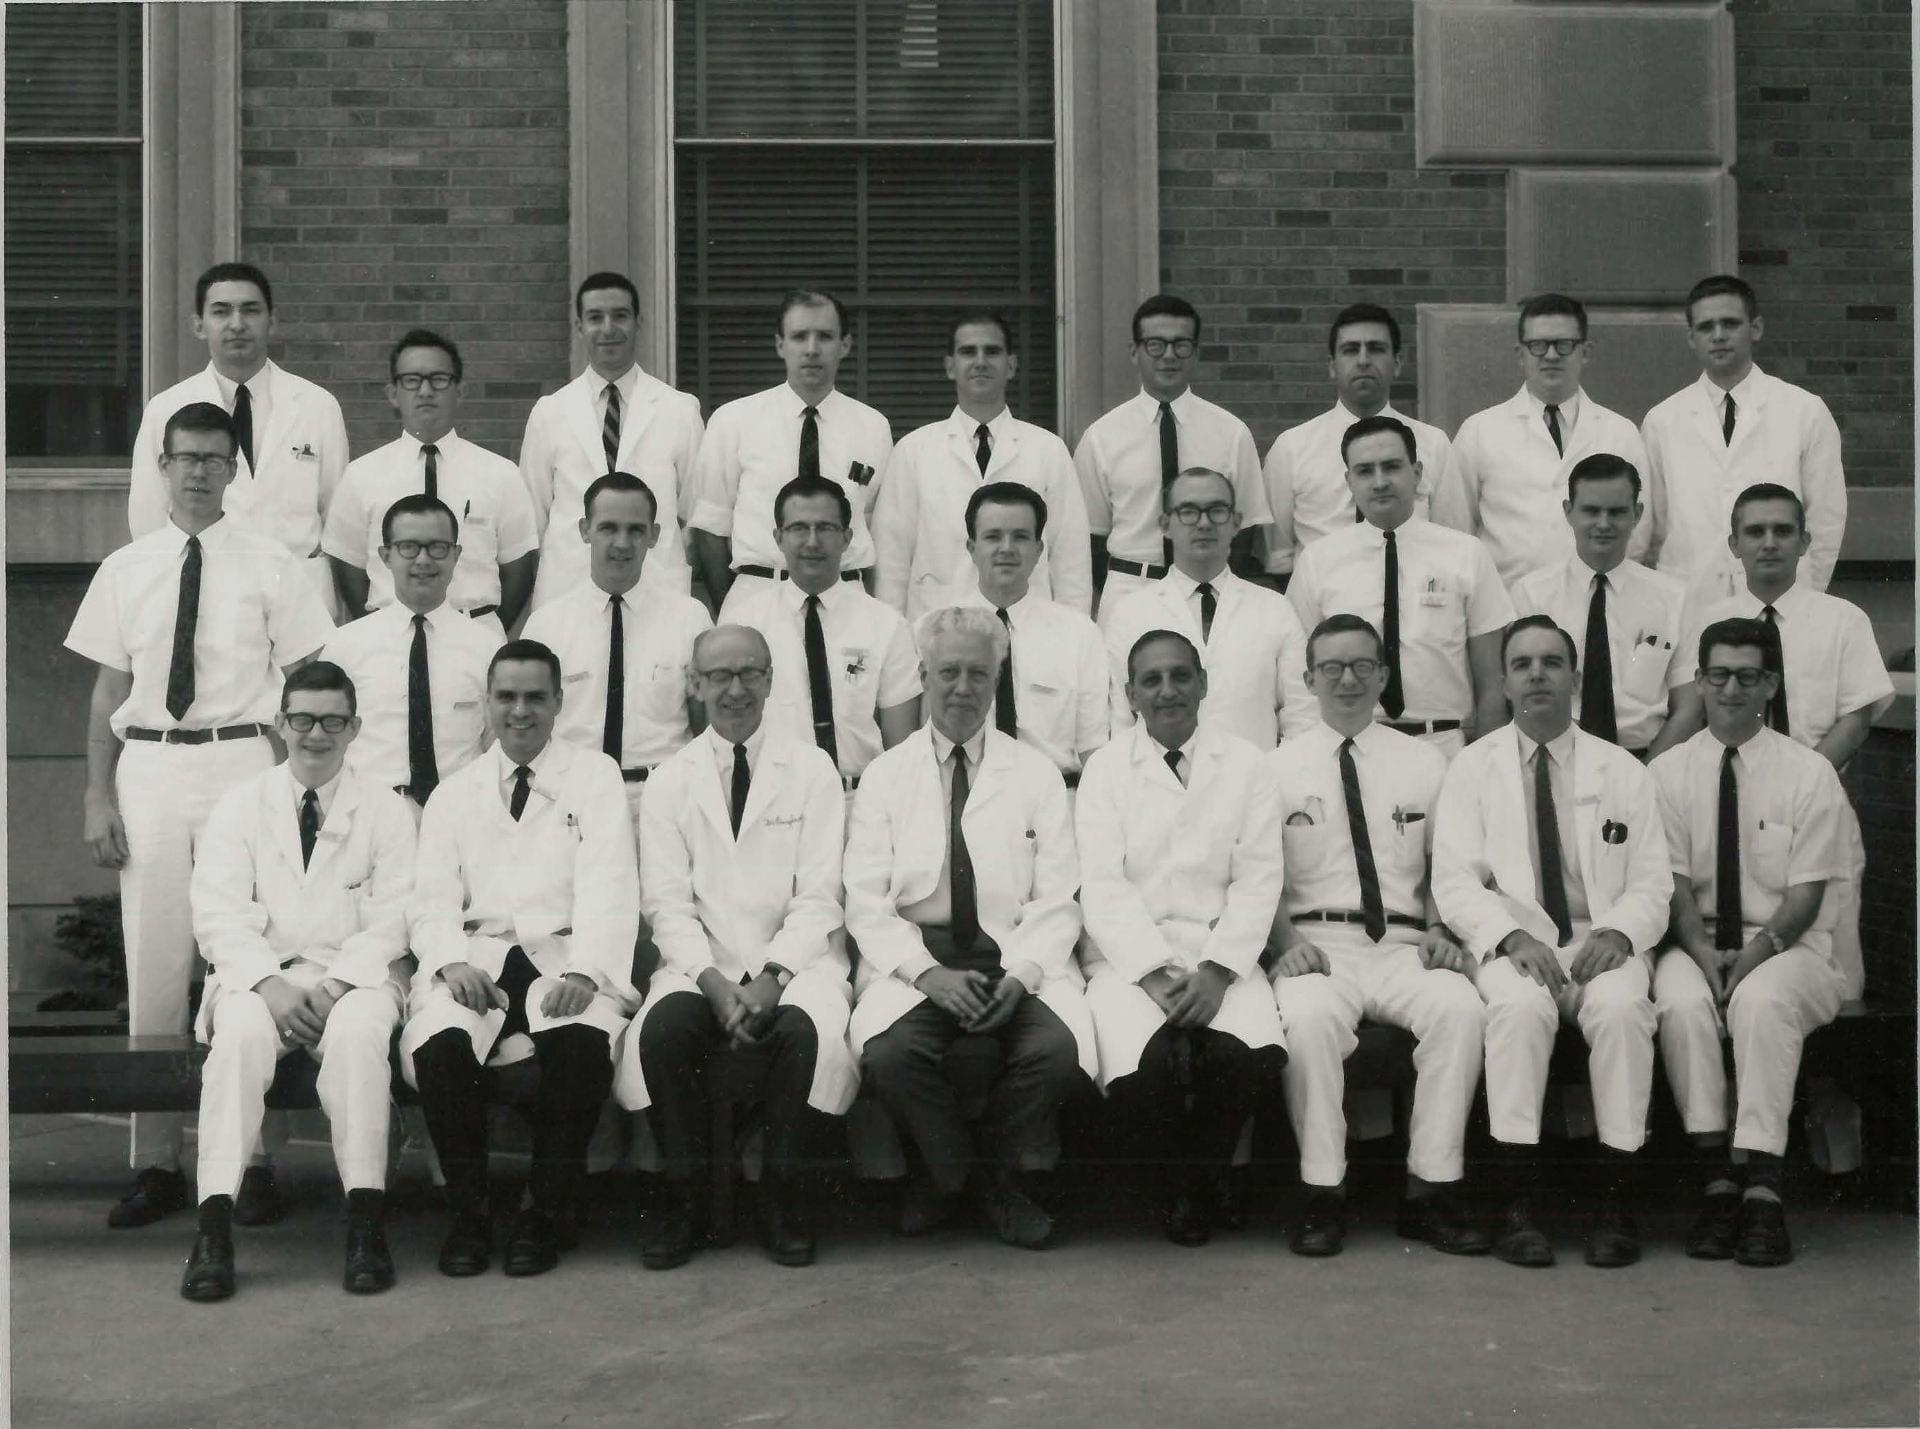 1965 Housestaff Photo (2)